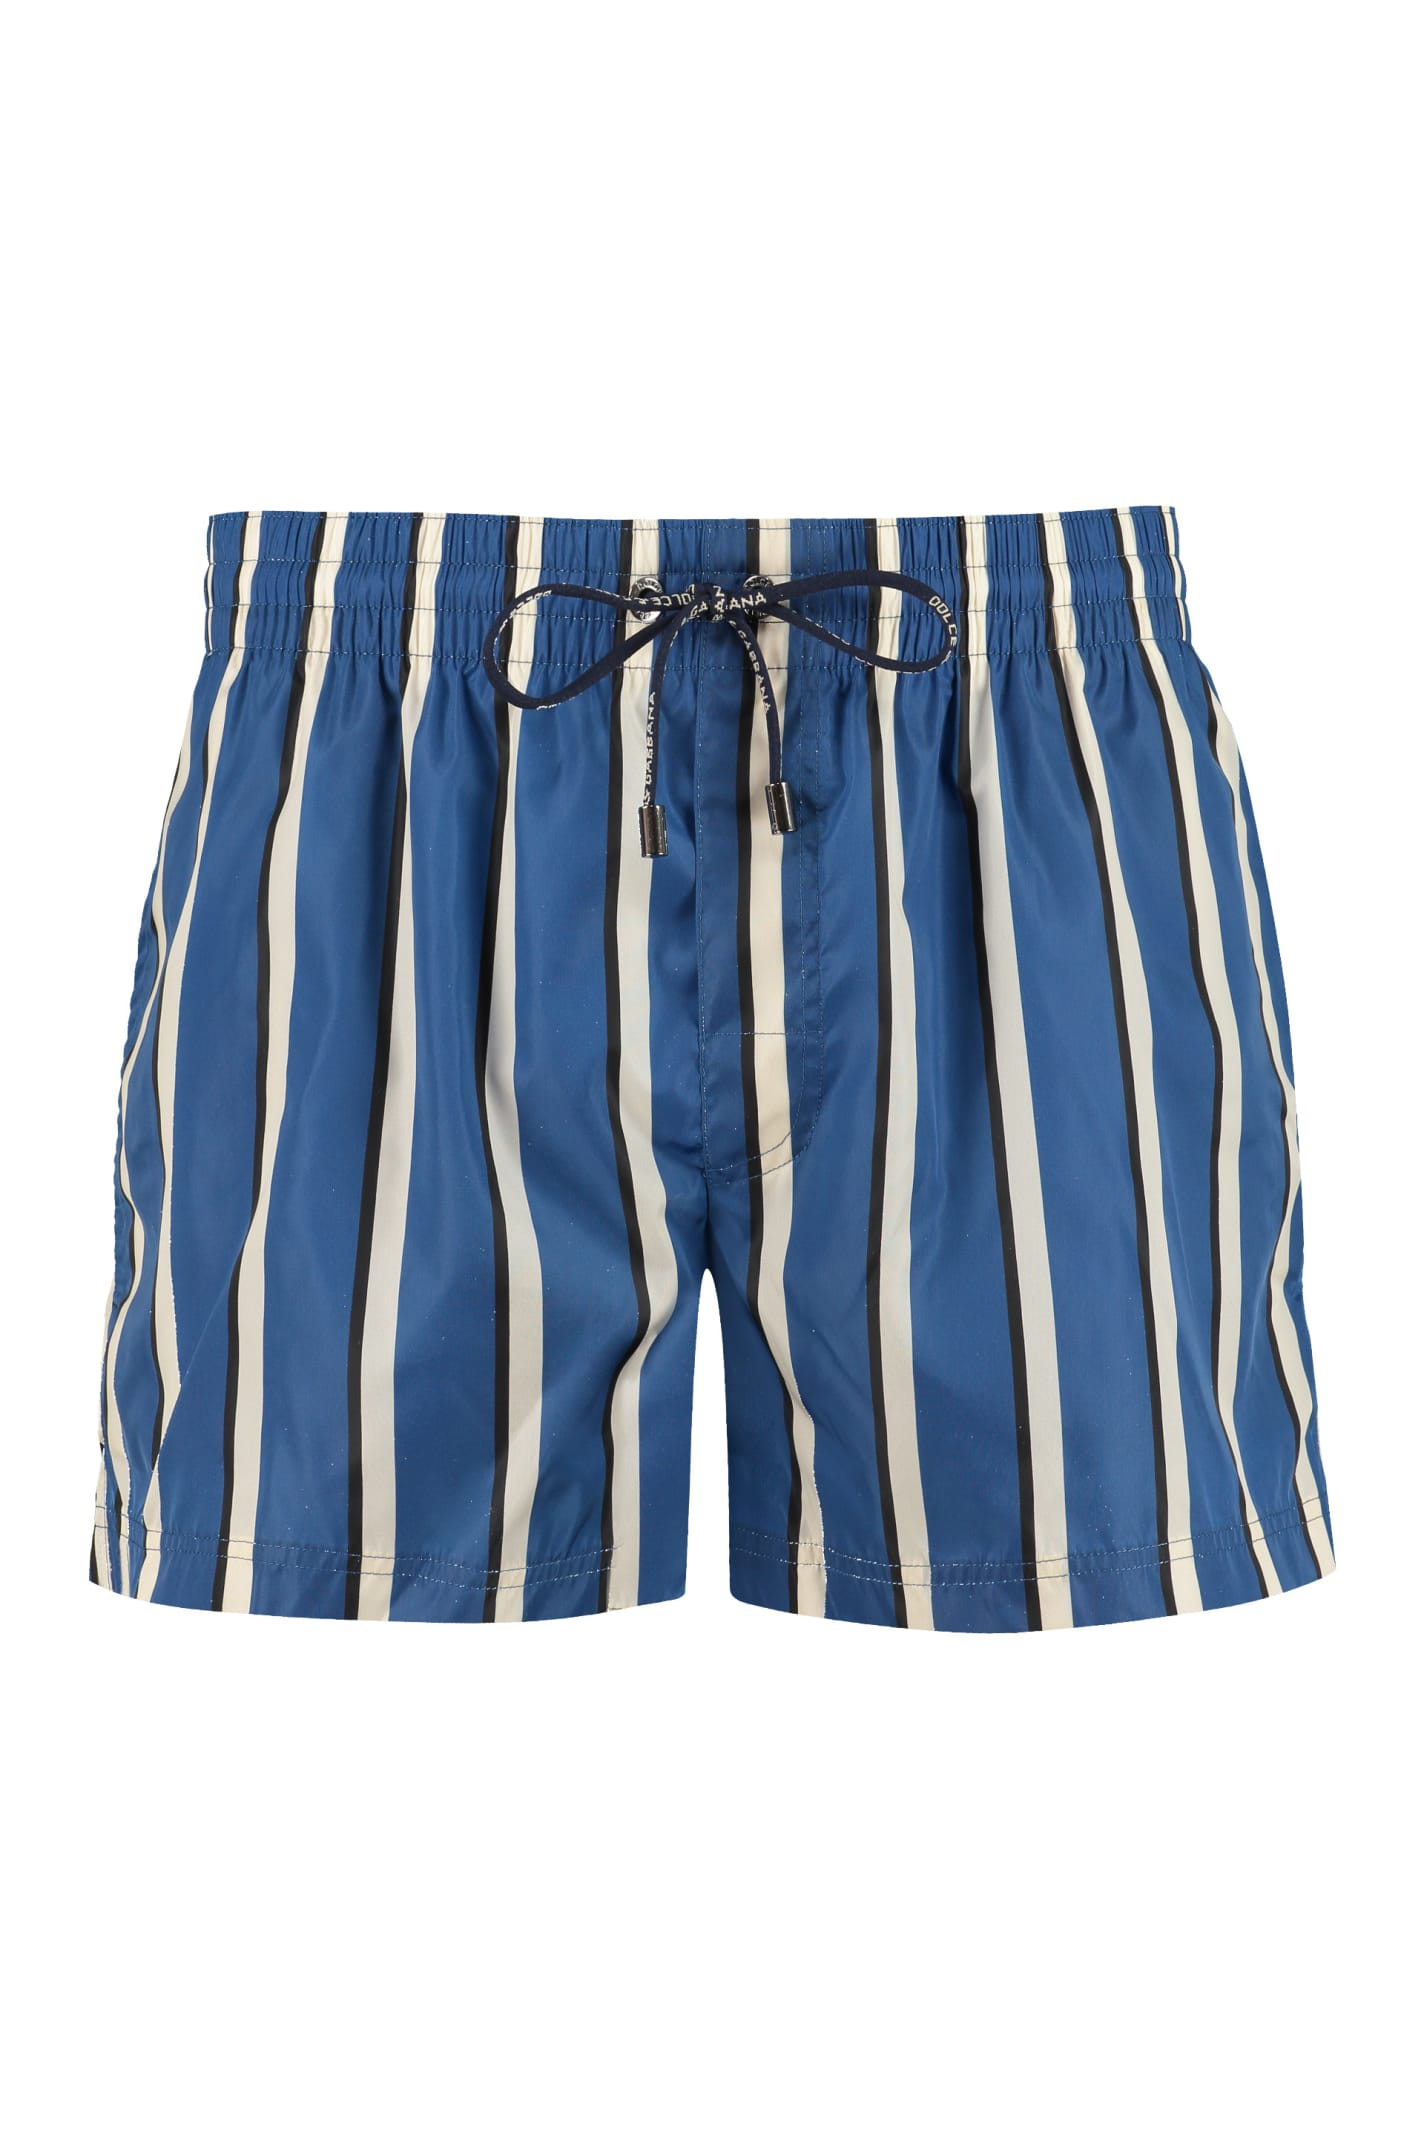 Dolce & Gabbana Beachwears PRINTED SWIM SHORTS